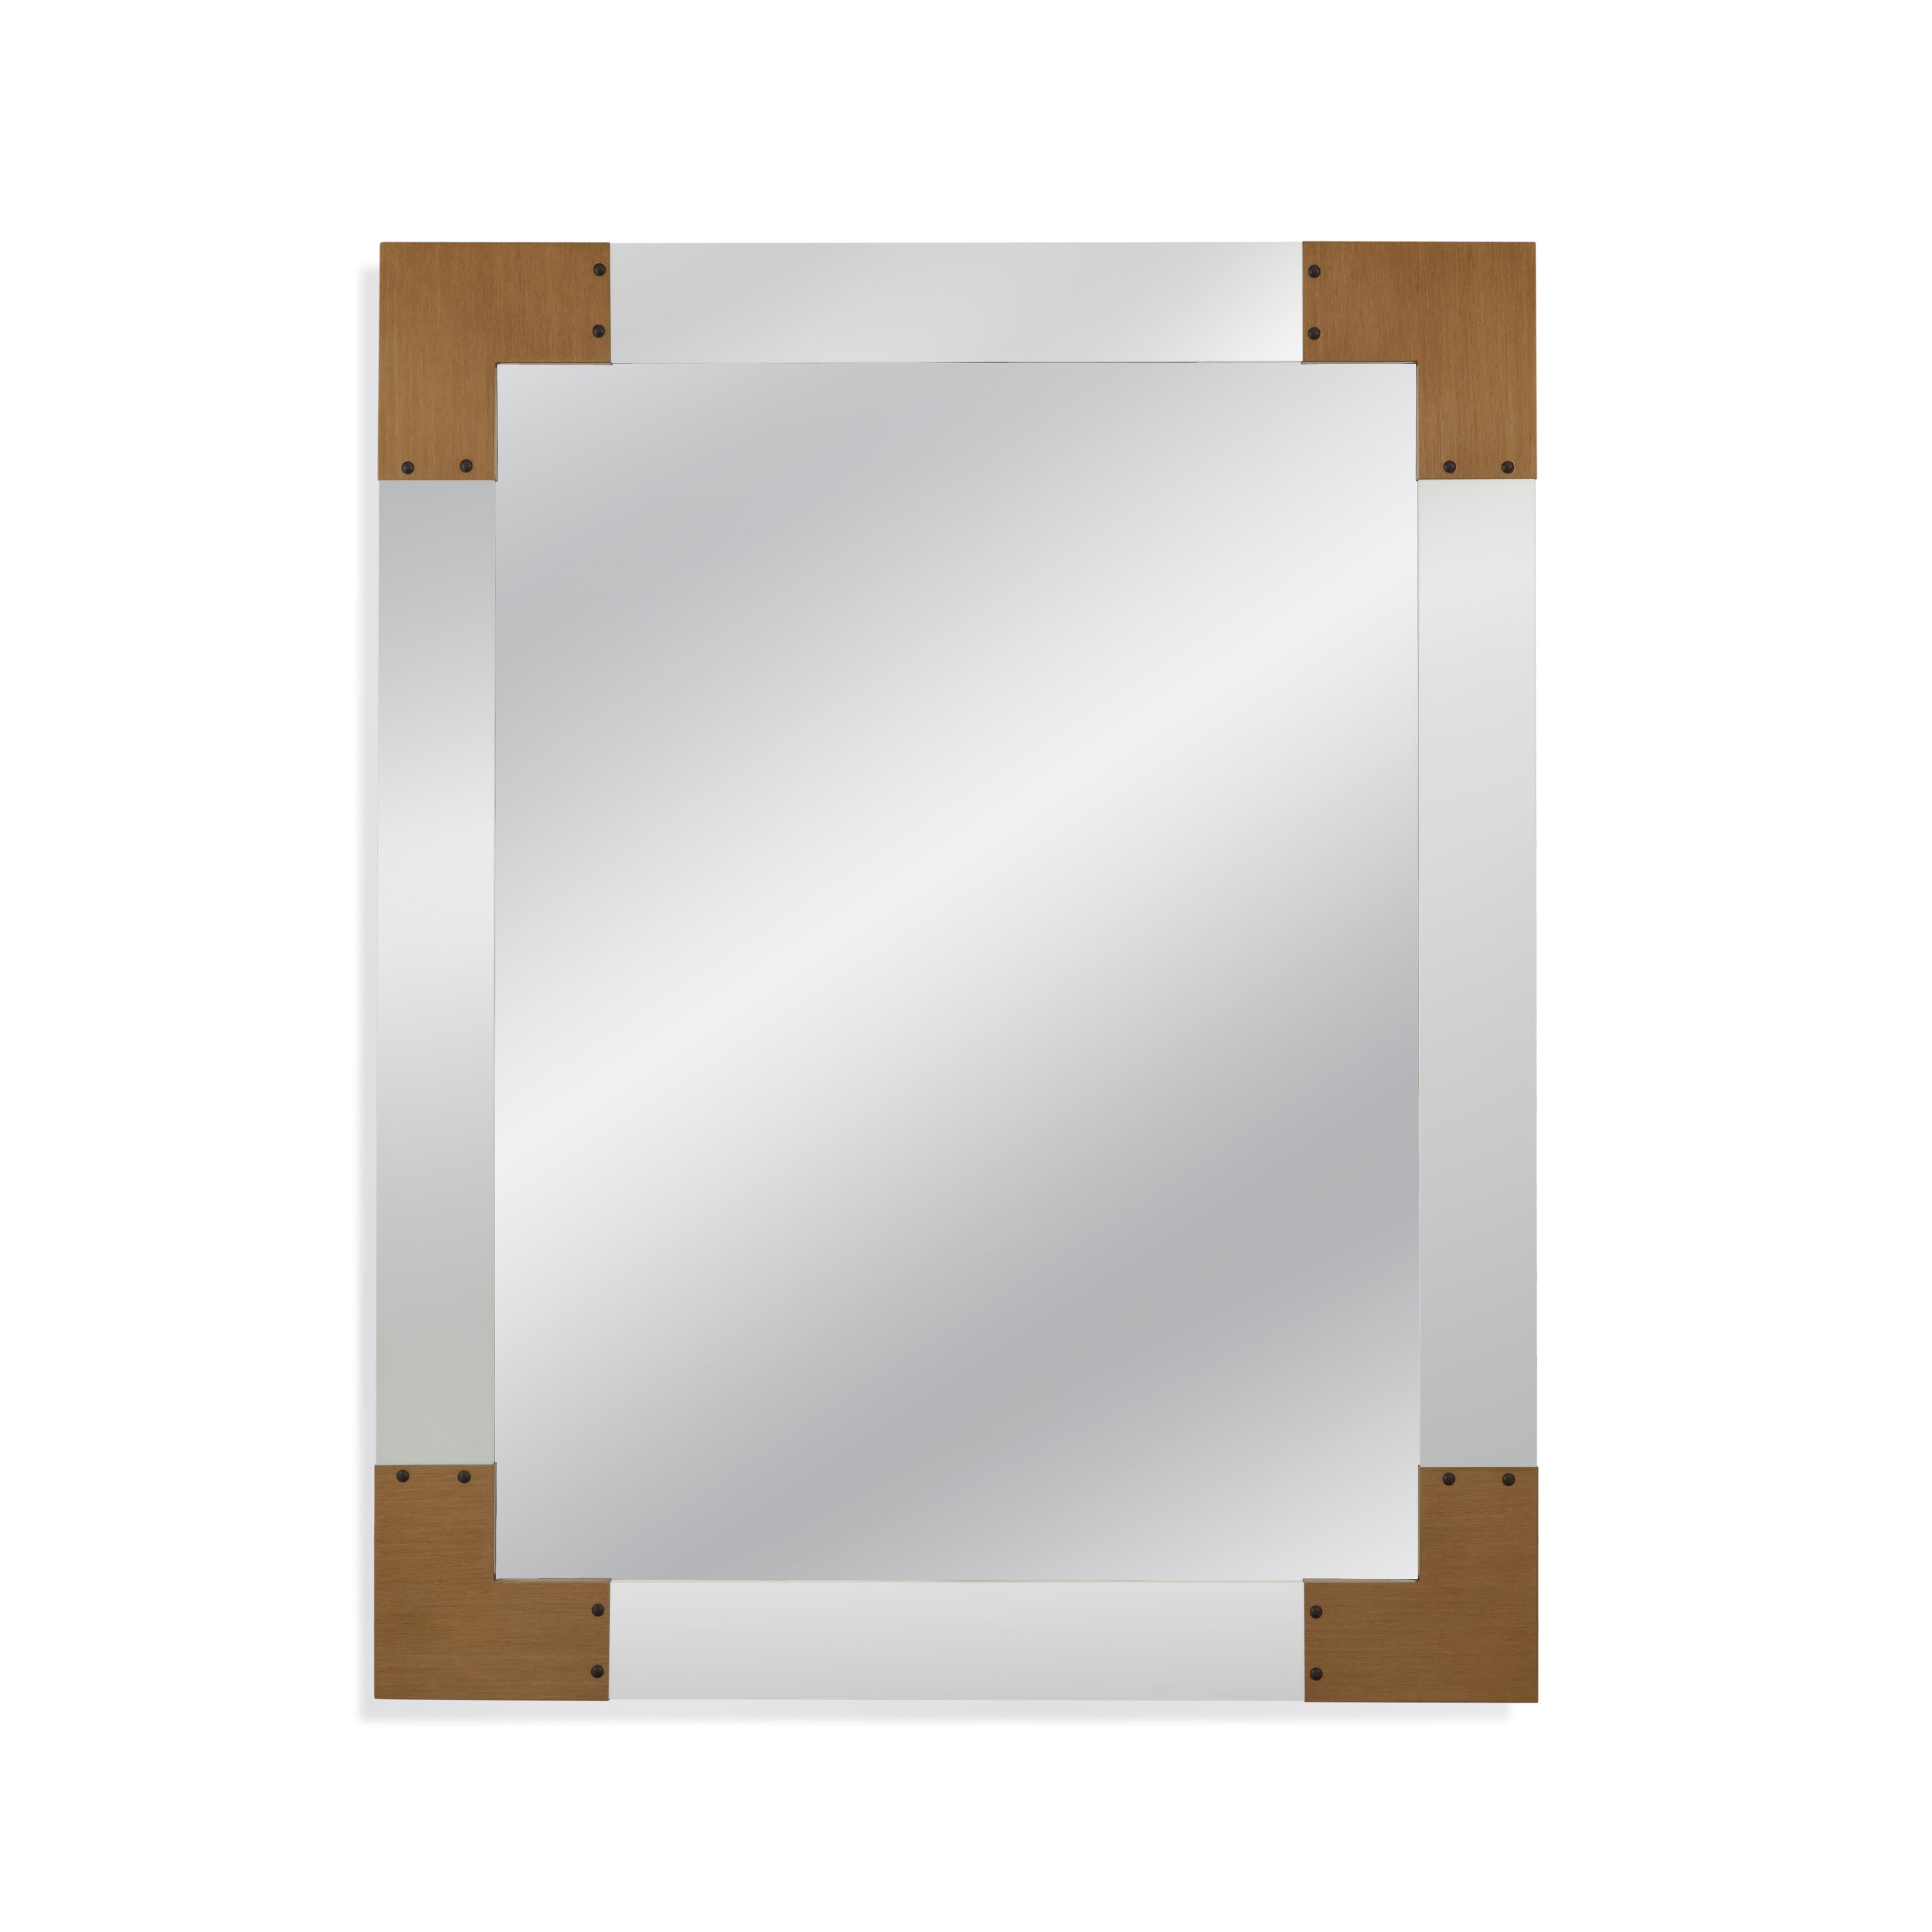 Old World Denton Wall Mirror by Bassett Mirror at Alison Craig Home Furnishings